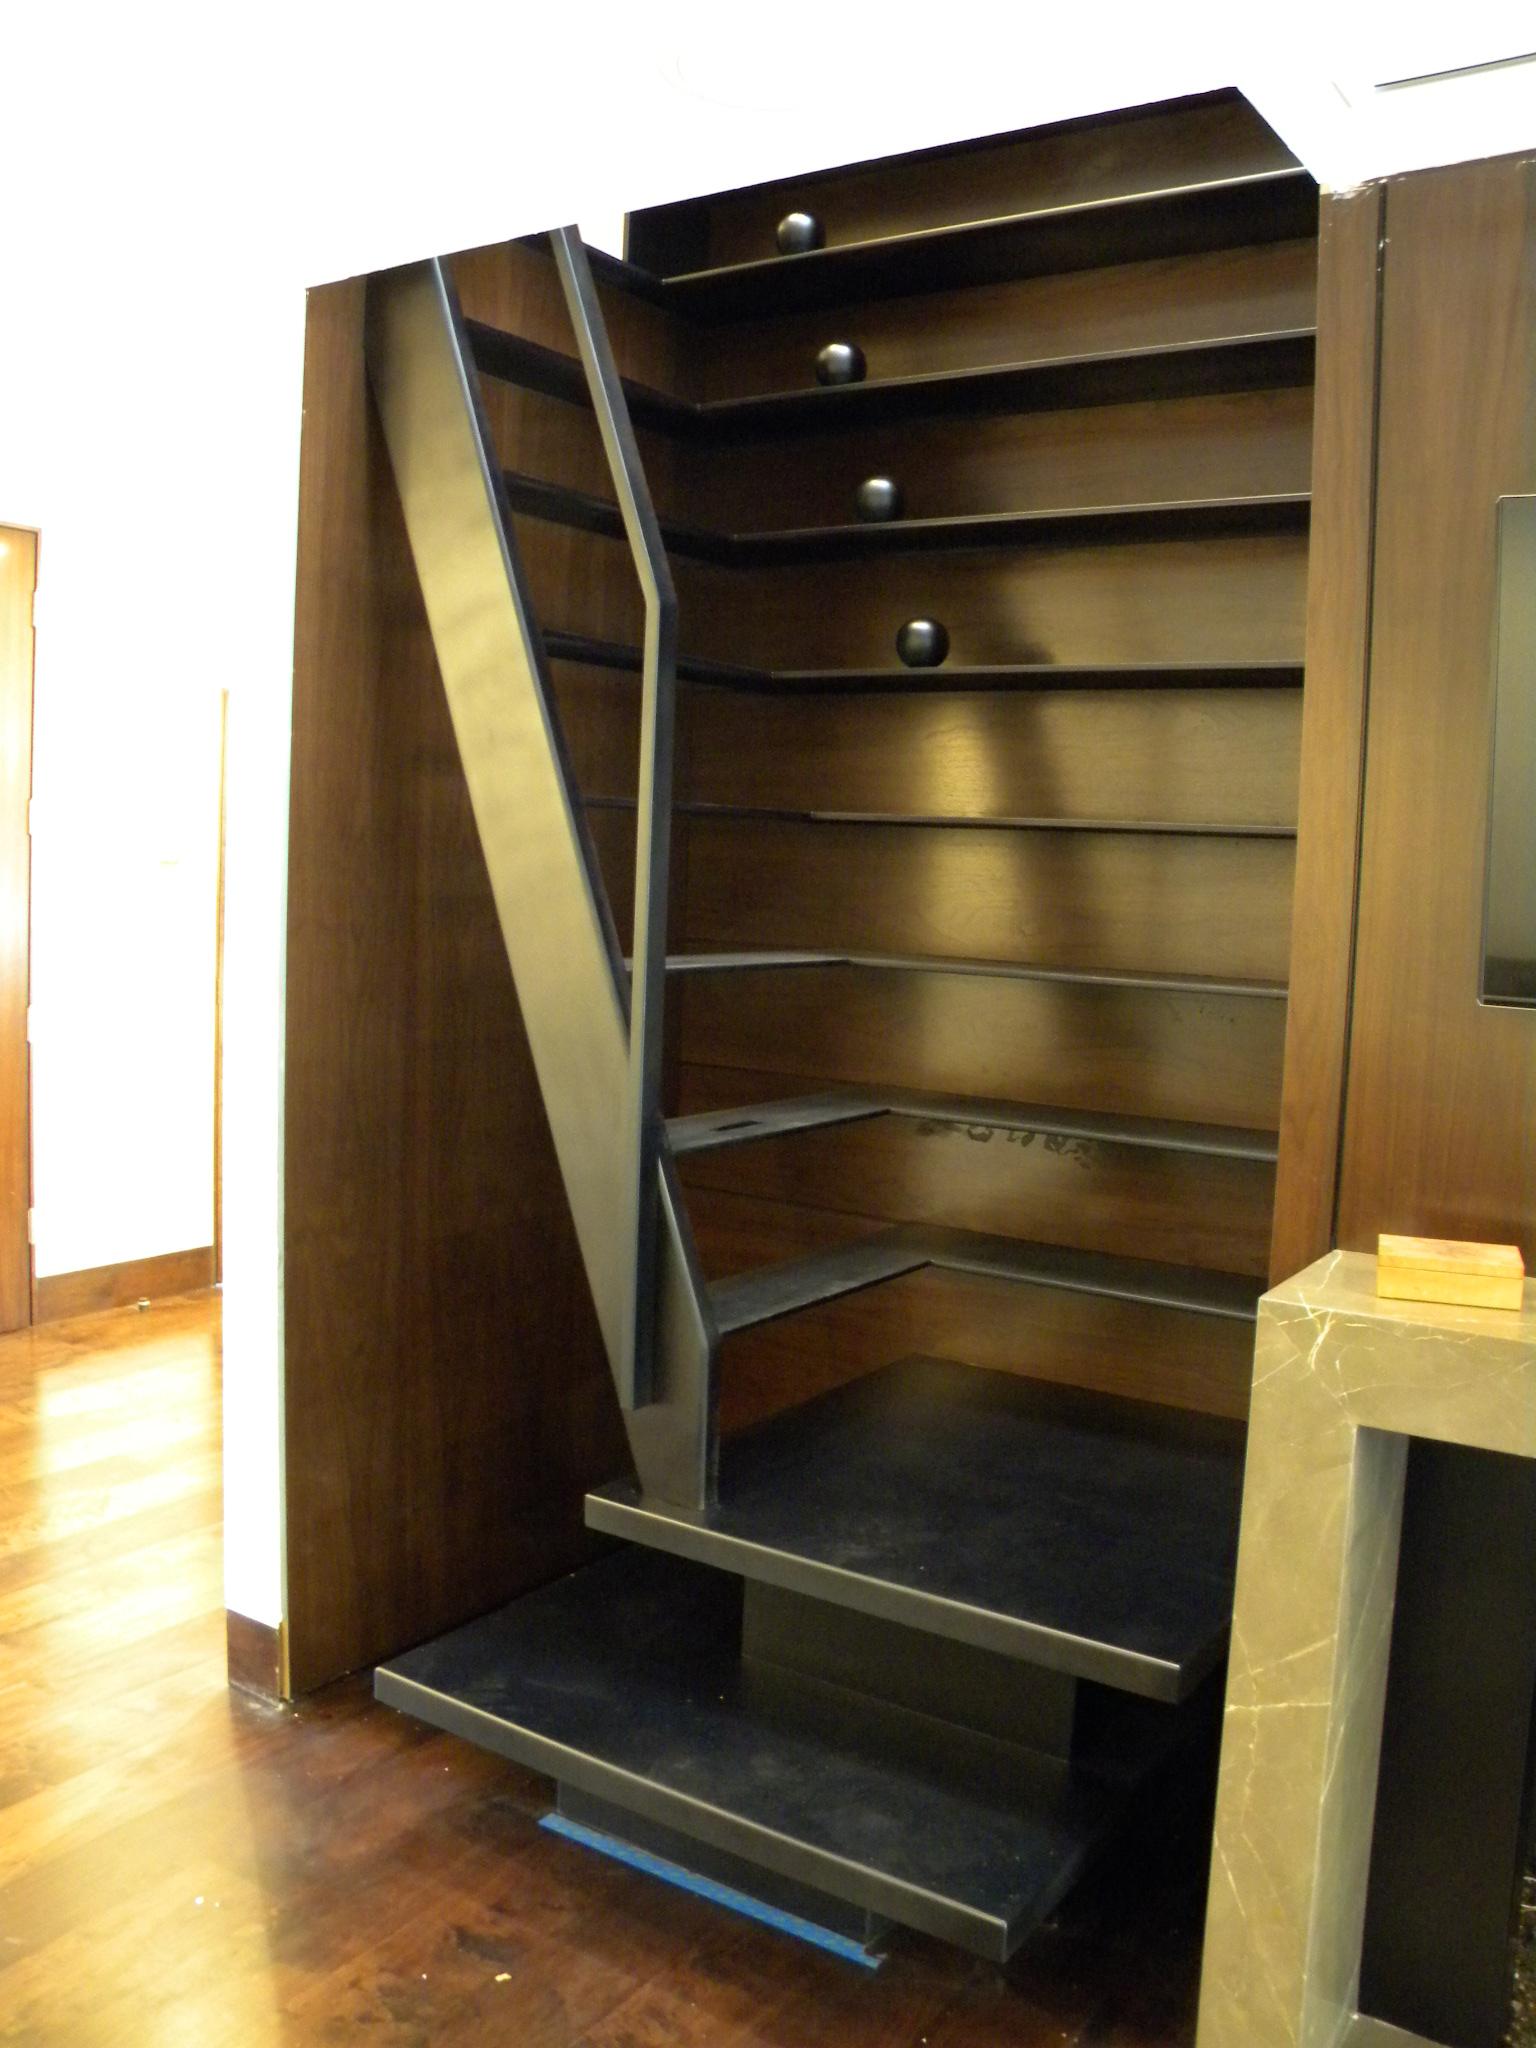 under-construction-ladder-staircase-DSCN7299.jpg